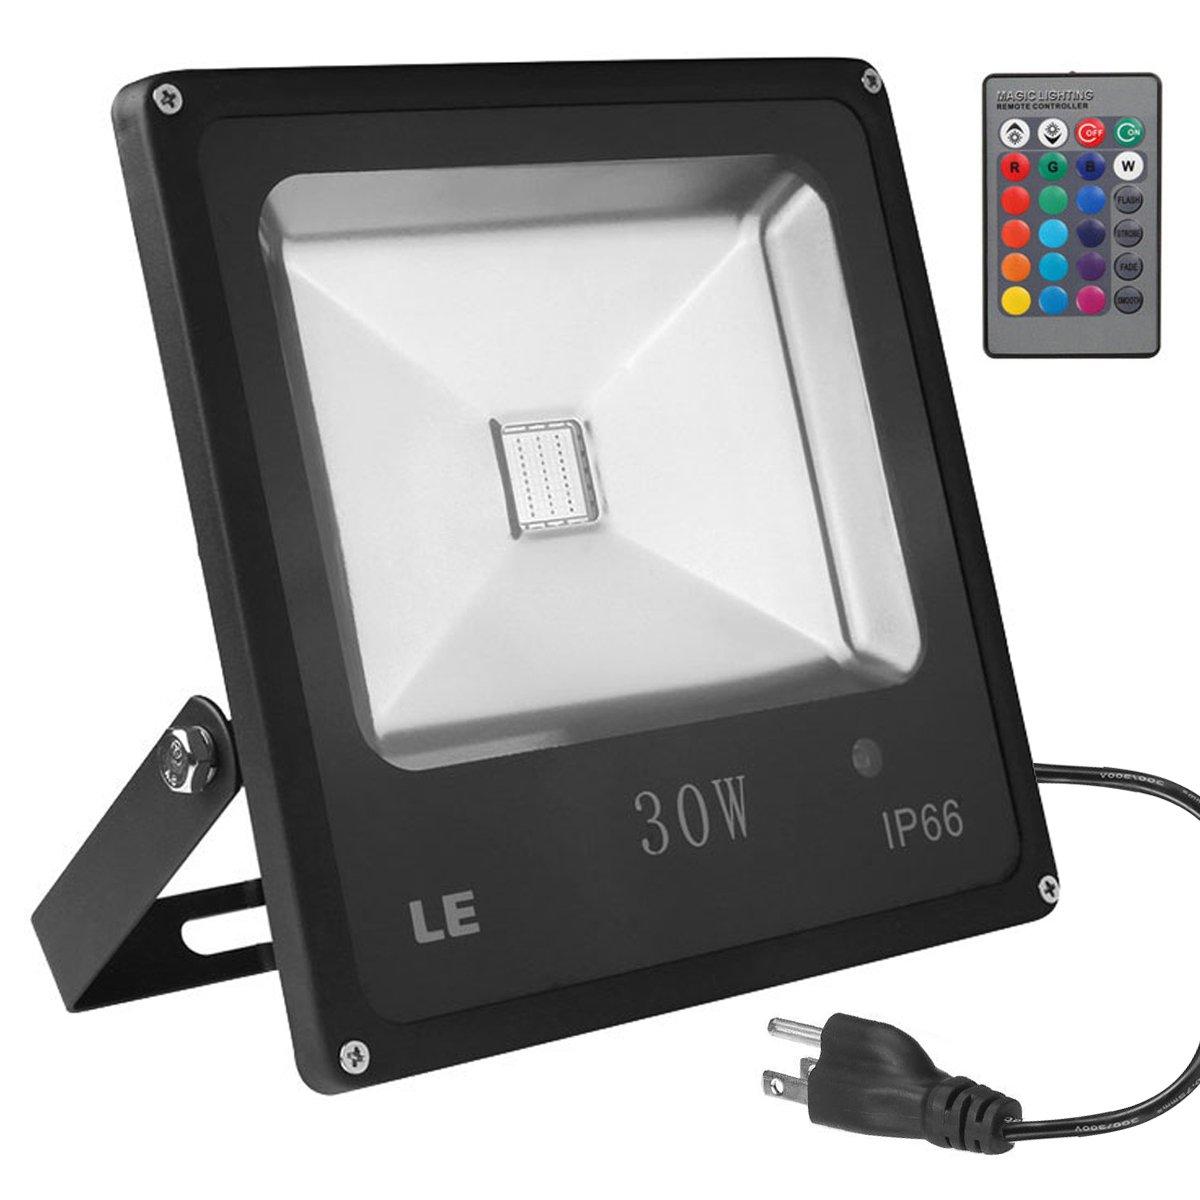 LE RGB 30W LED投光器 リモコン操作 調光 調色 16色 4発光モード 省エネ 広角120° ACプラグ付属(1m)可搬型 防水仕様IP66 投光機 フラッドライト 舞台照明 看板灯 作業灯 ワークライト B00MHLIJ6W 13662